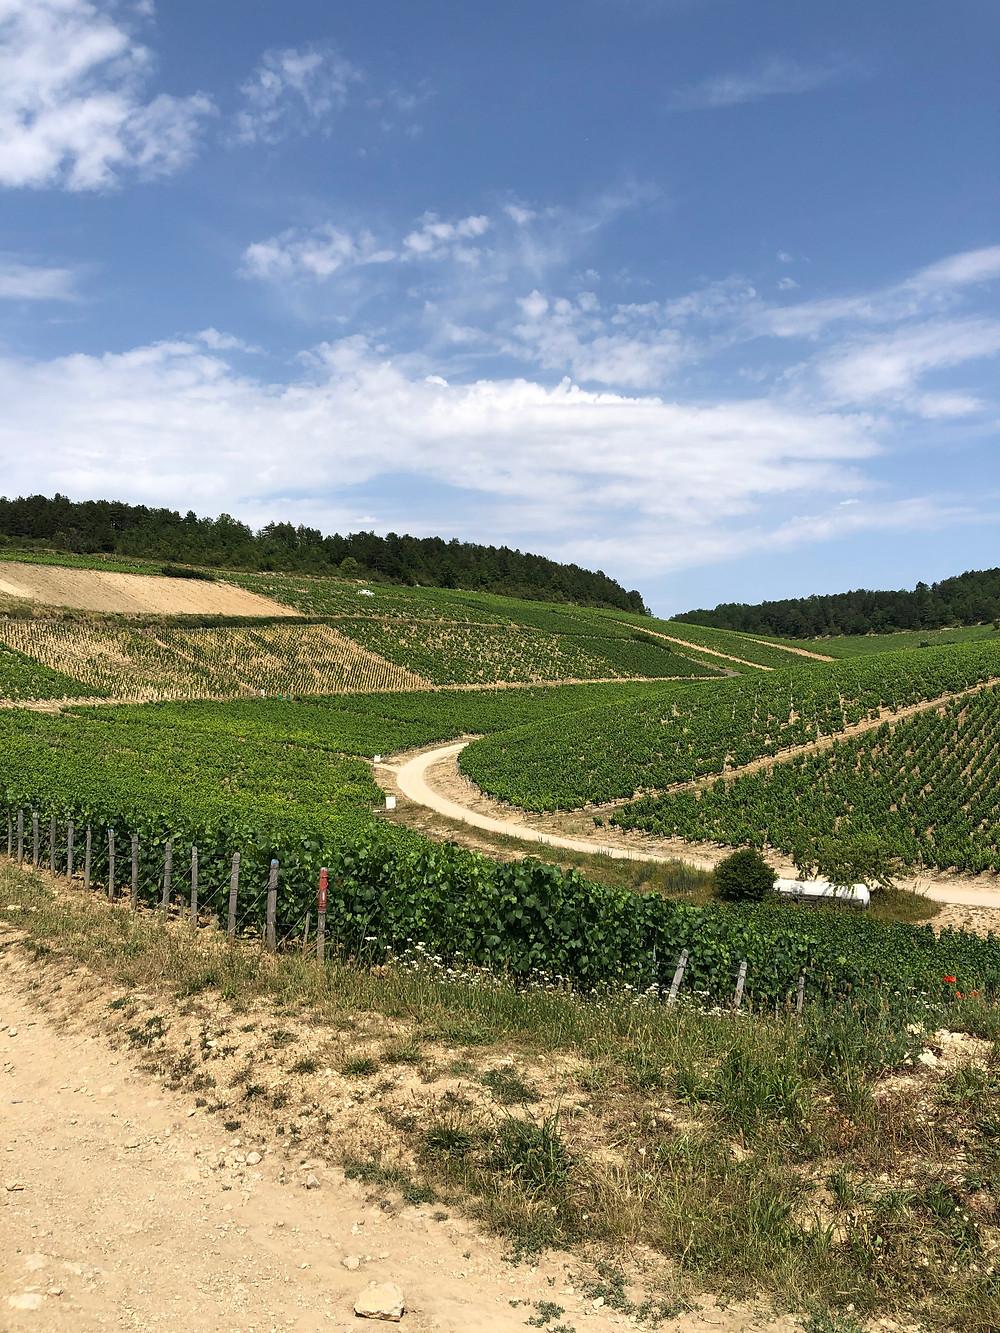 Grand Cru and Petit Chablis vineyards in Burgundy on a wine study trip